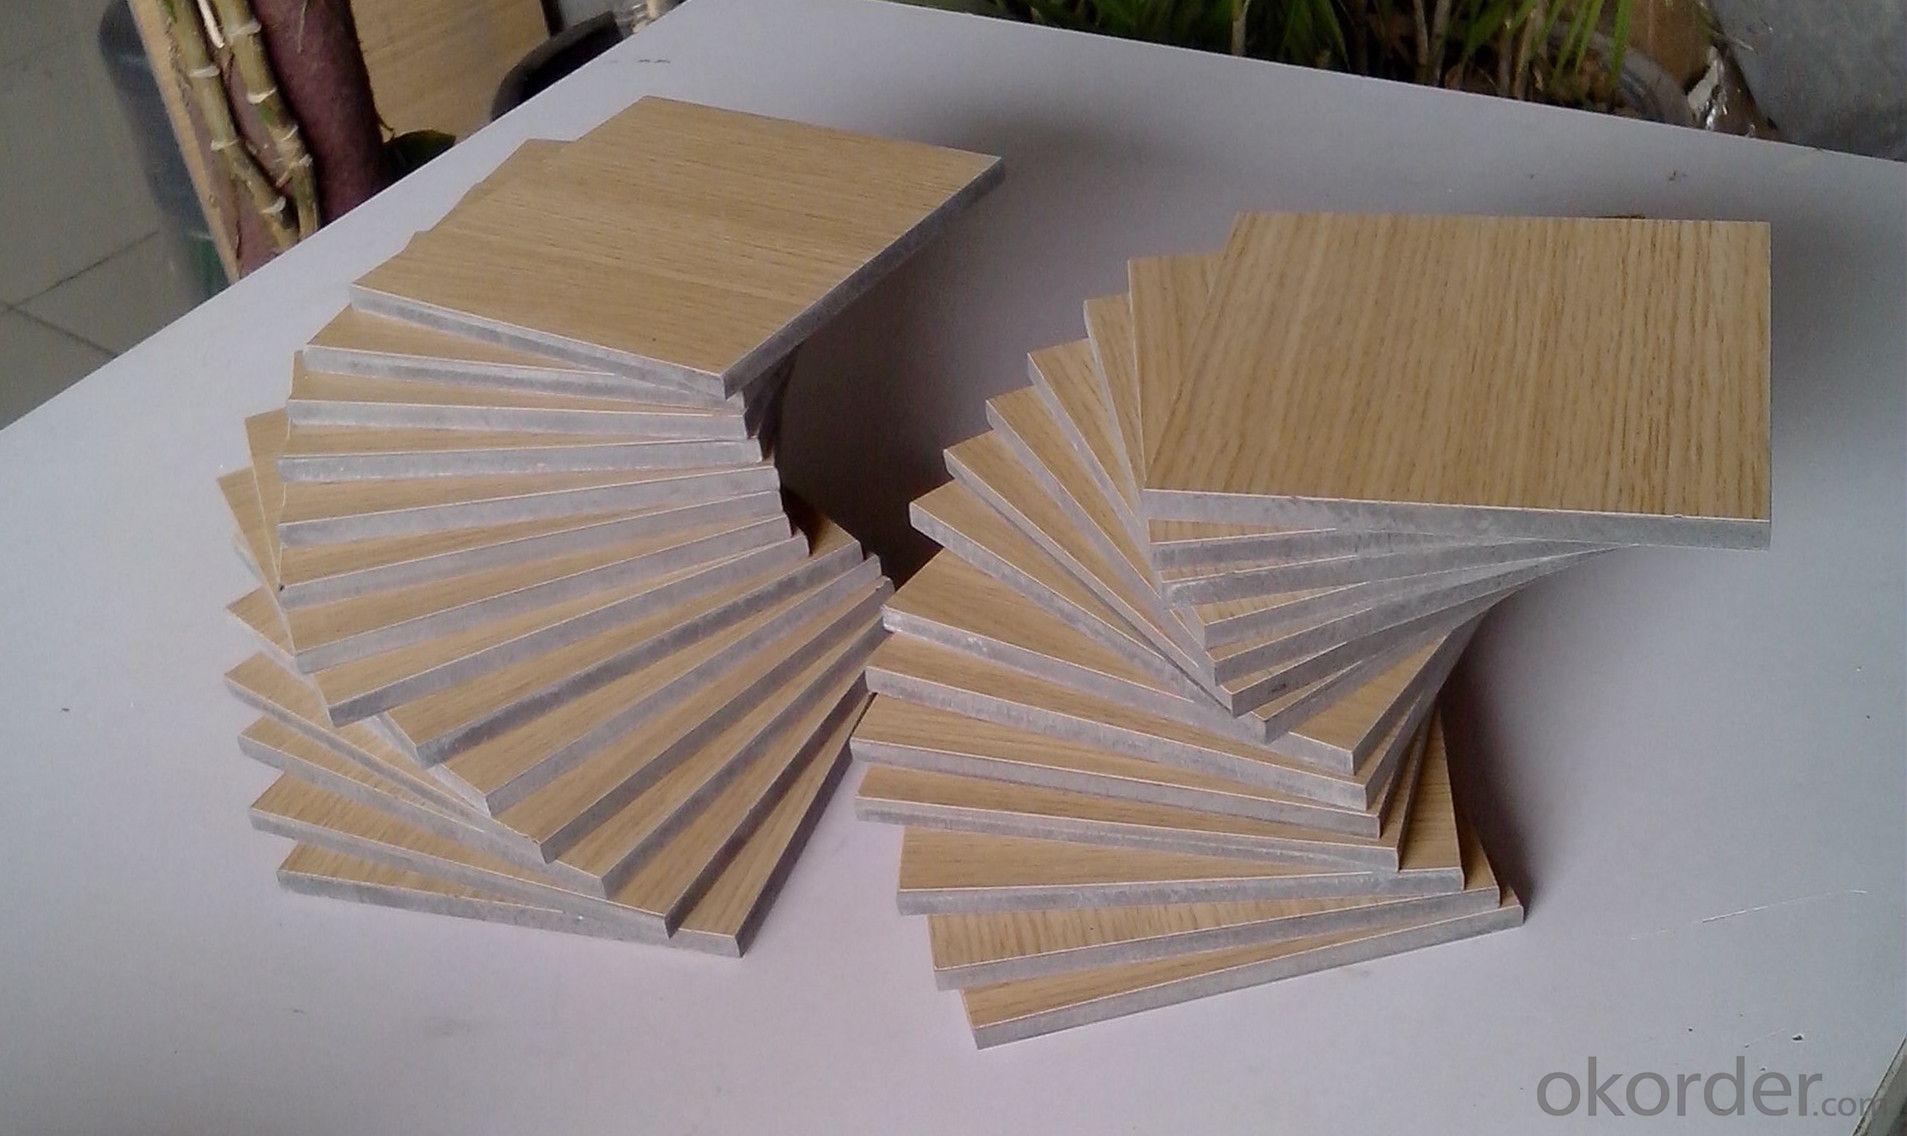 Compact High Pressure Laminate Wood Grain Surface